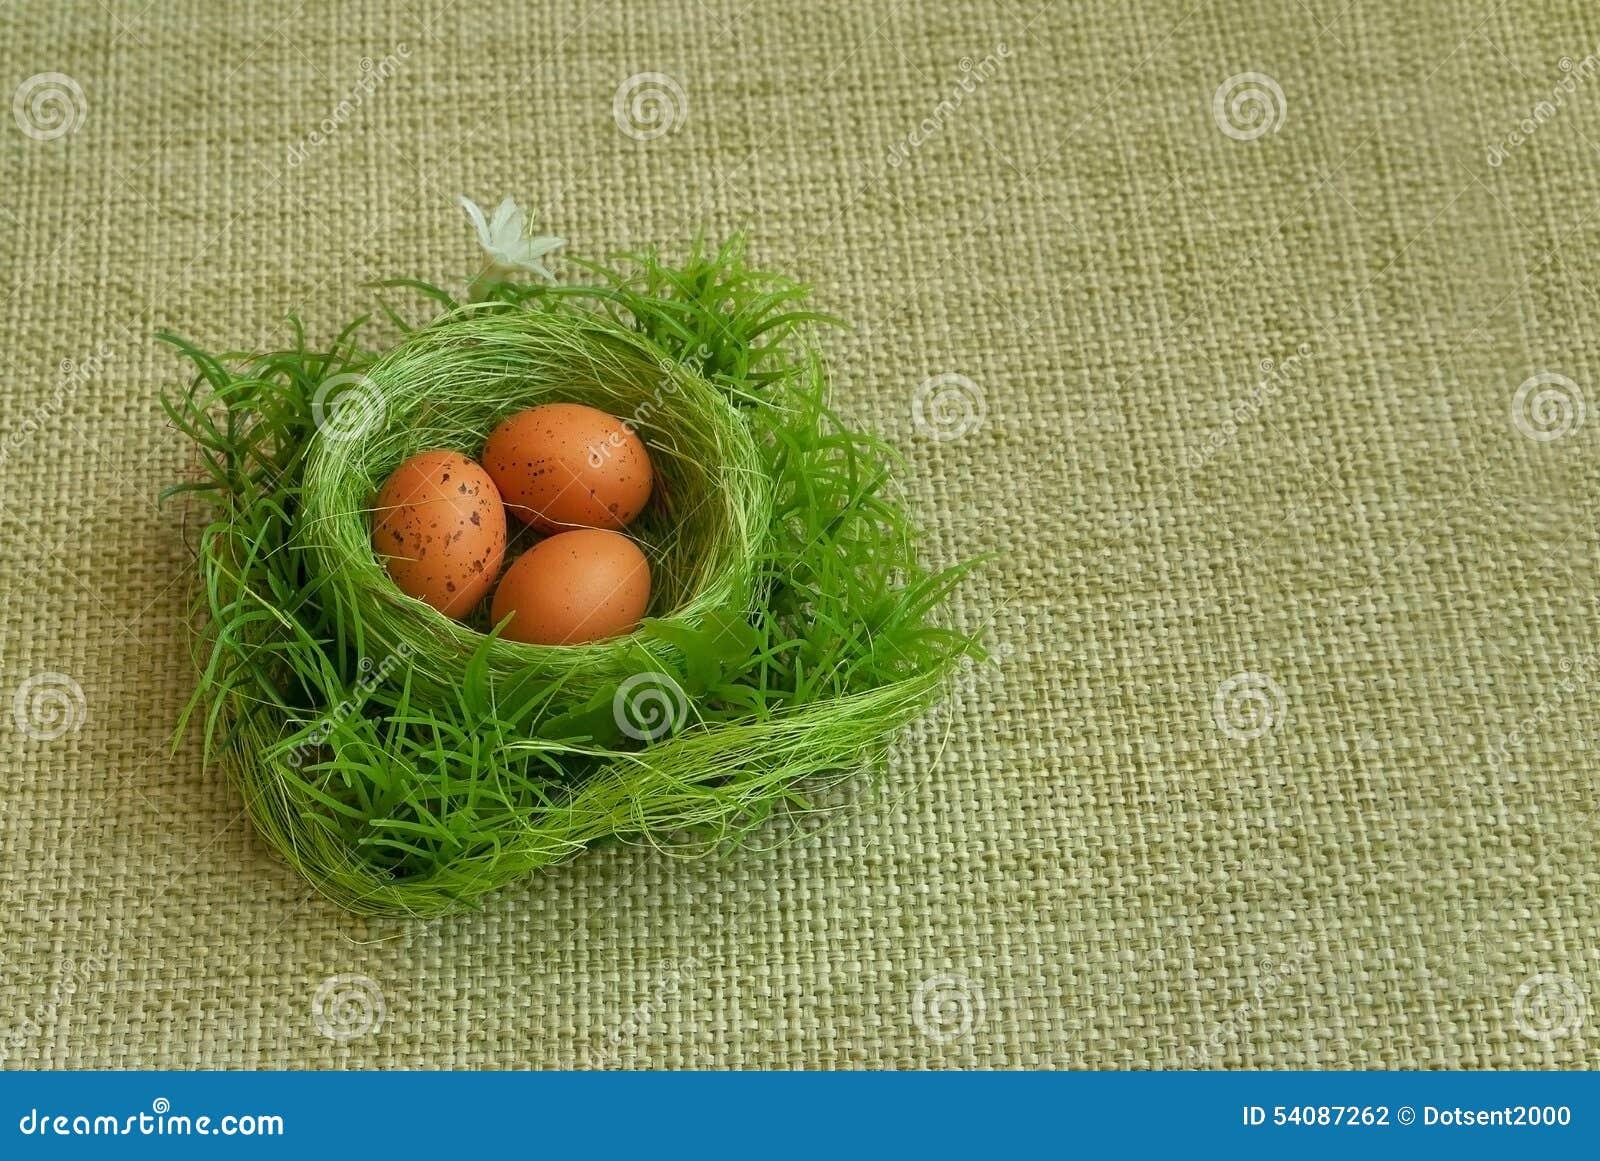 Gouden ei over groene gradiëntachtergrond